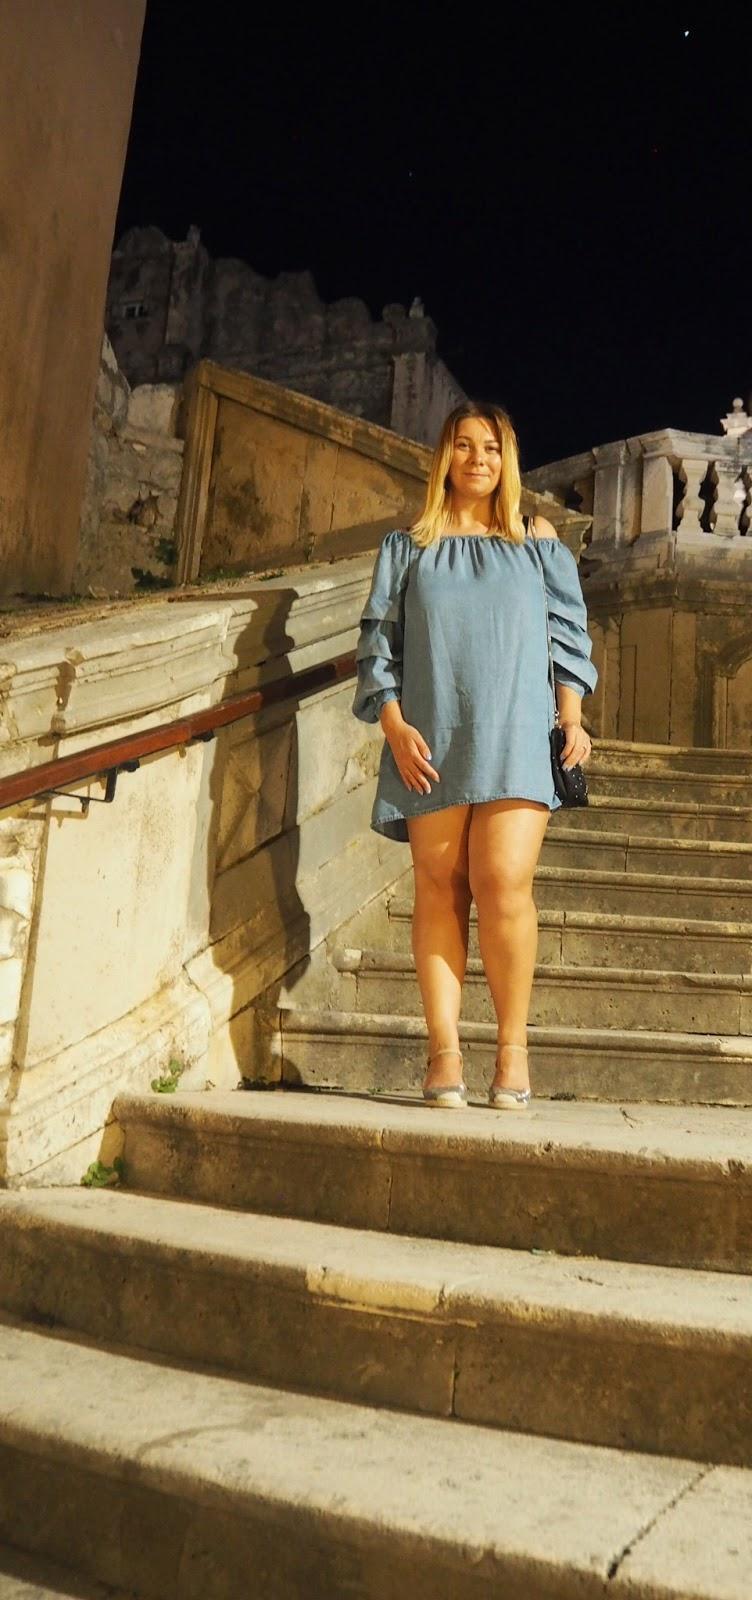 Cersei's GoT Croatian steps of shame in Dubrovnik